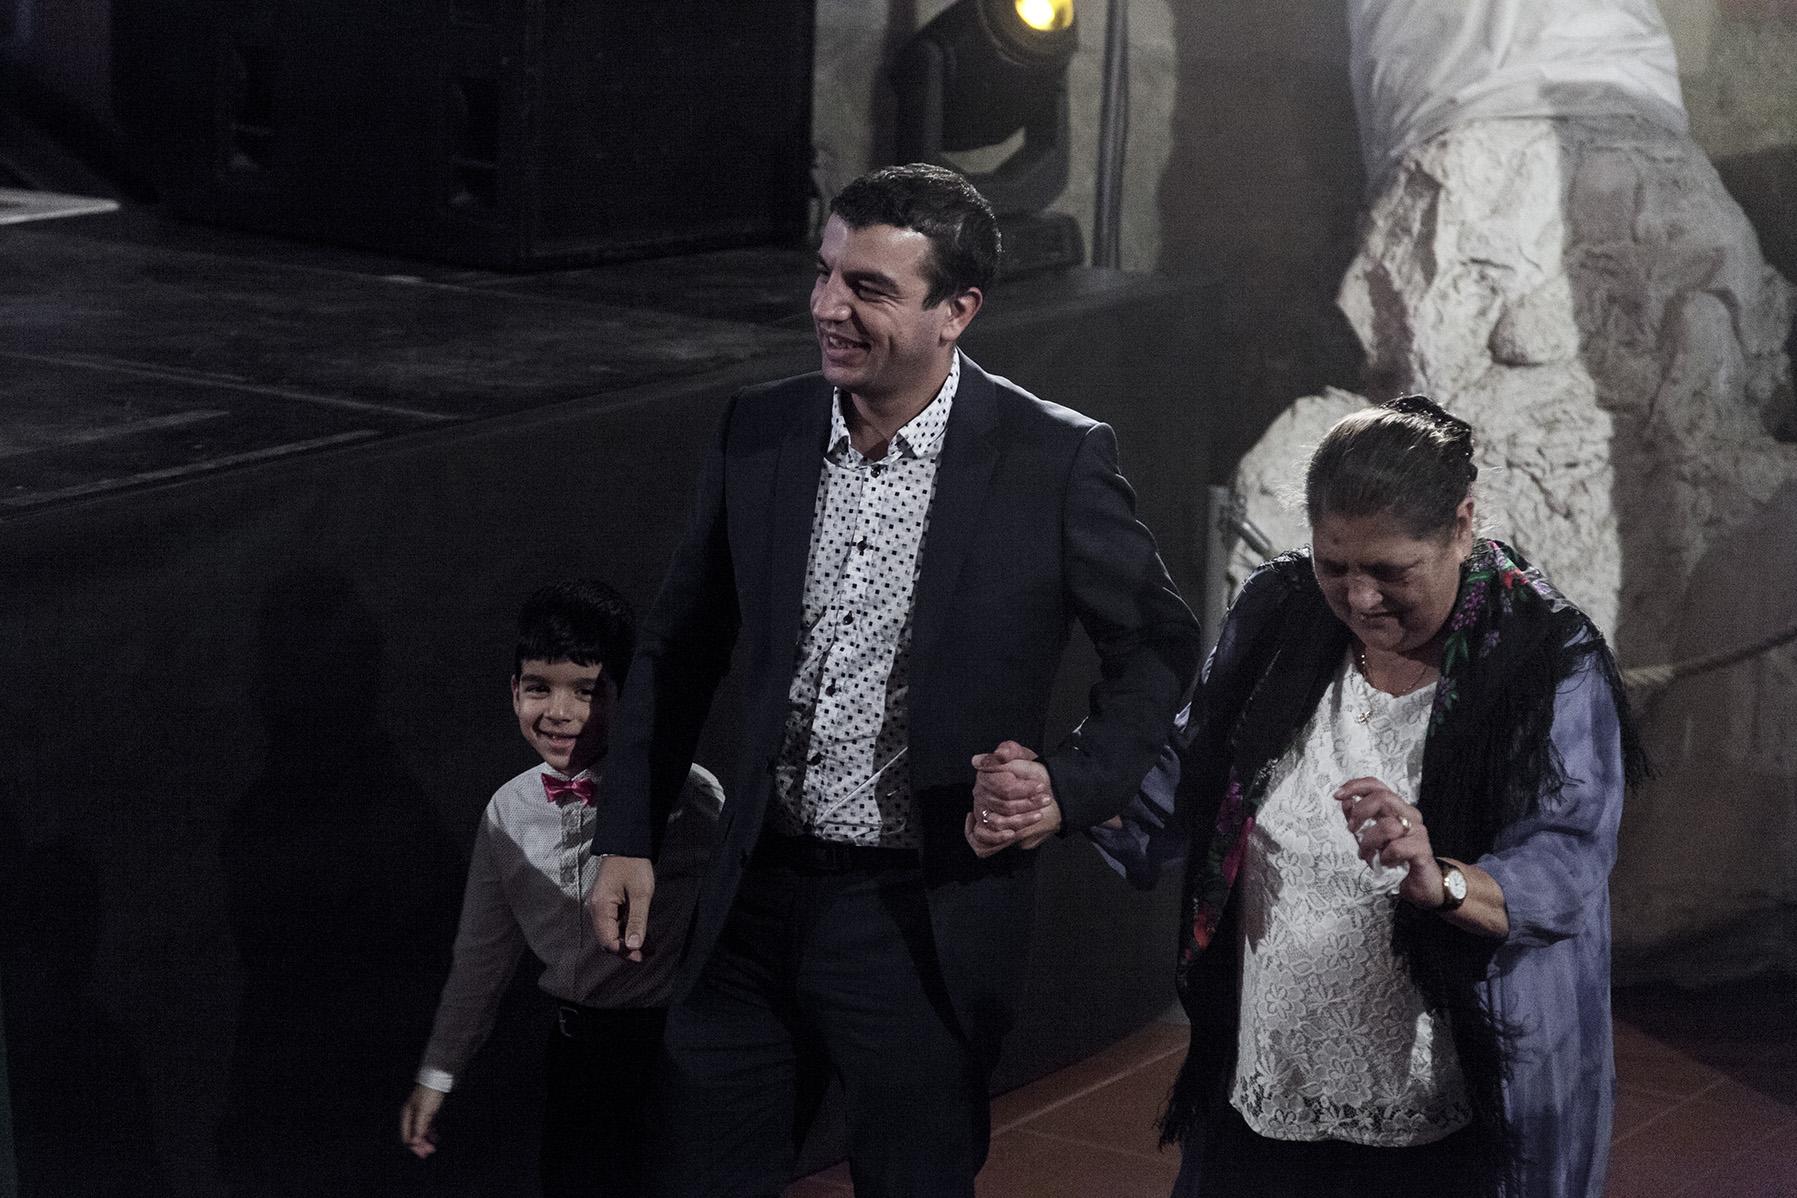 Richard Samko doprovodil Olgu Fečovou na pódium pro cenu.